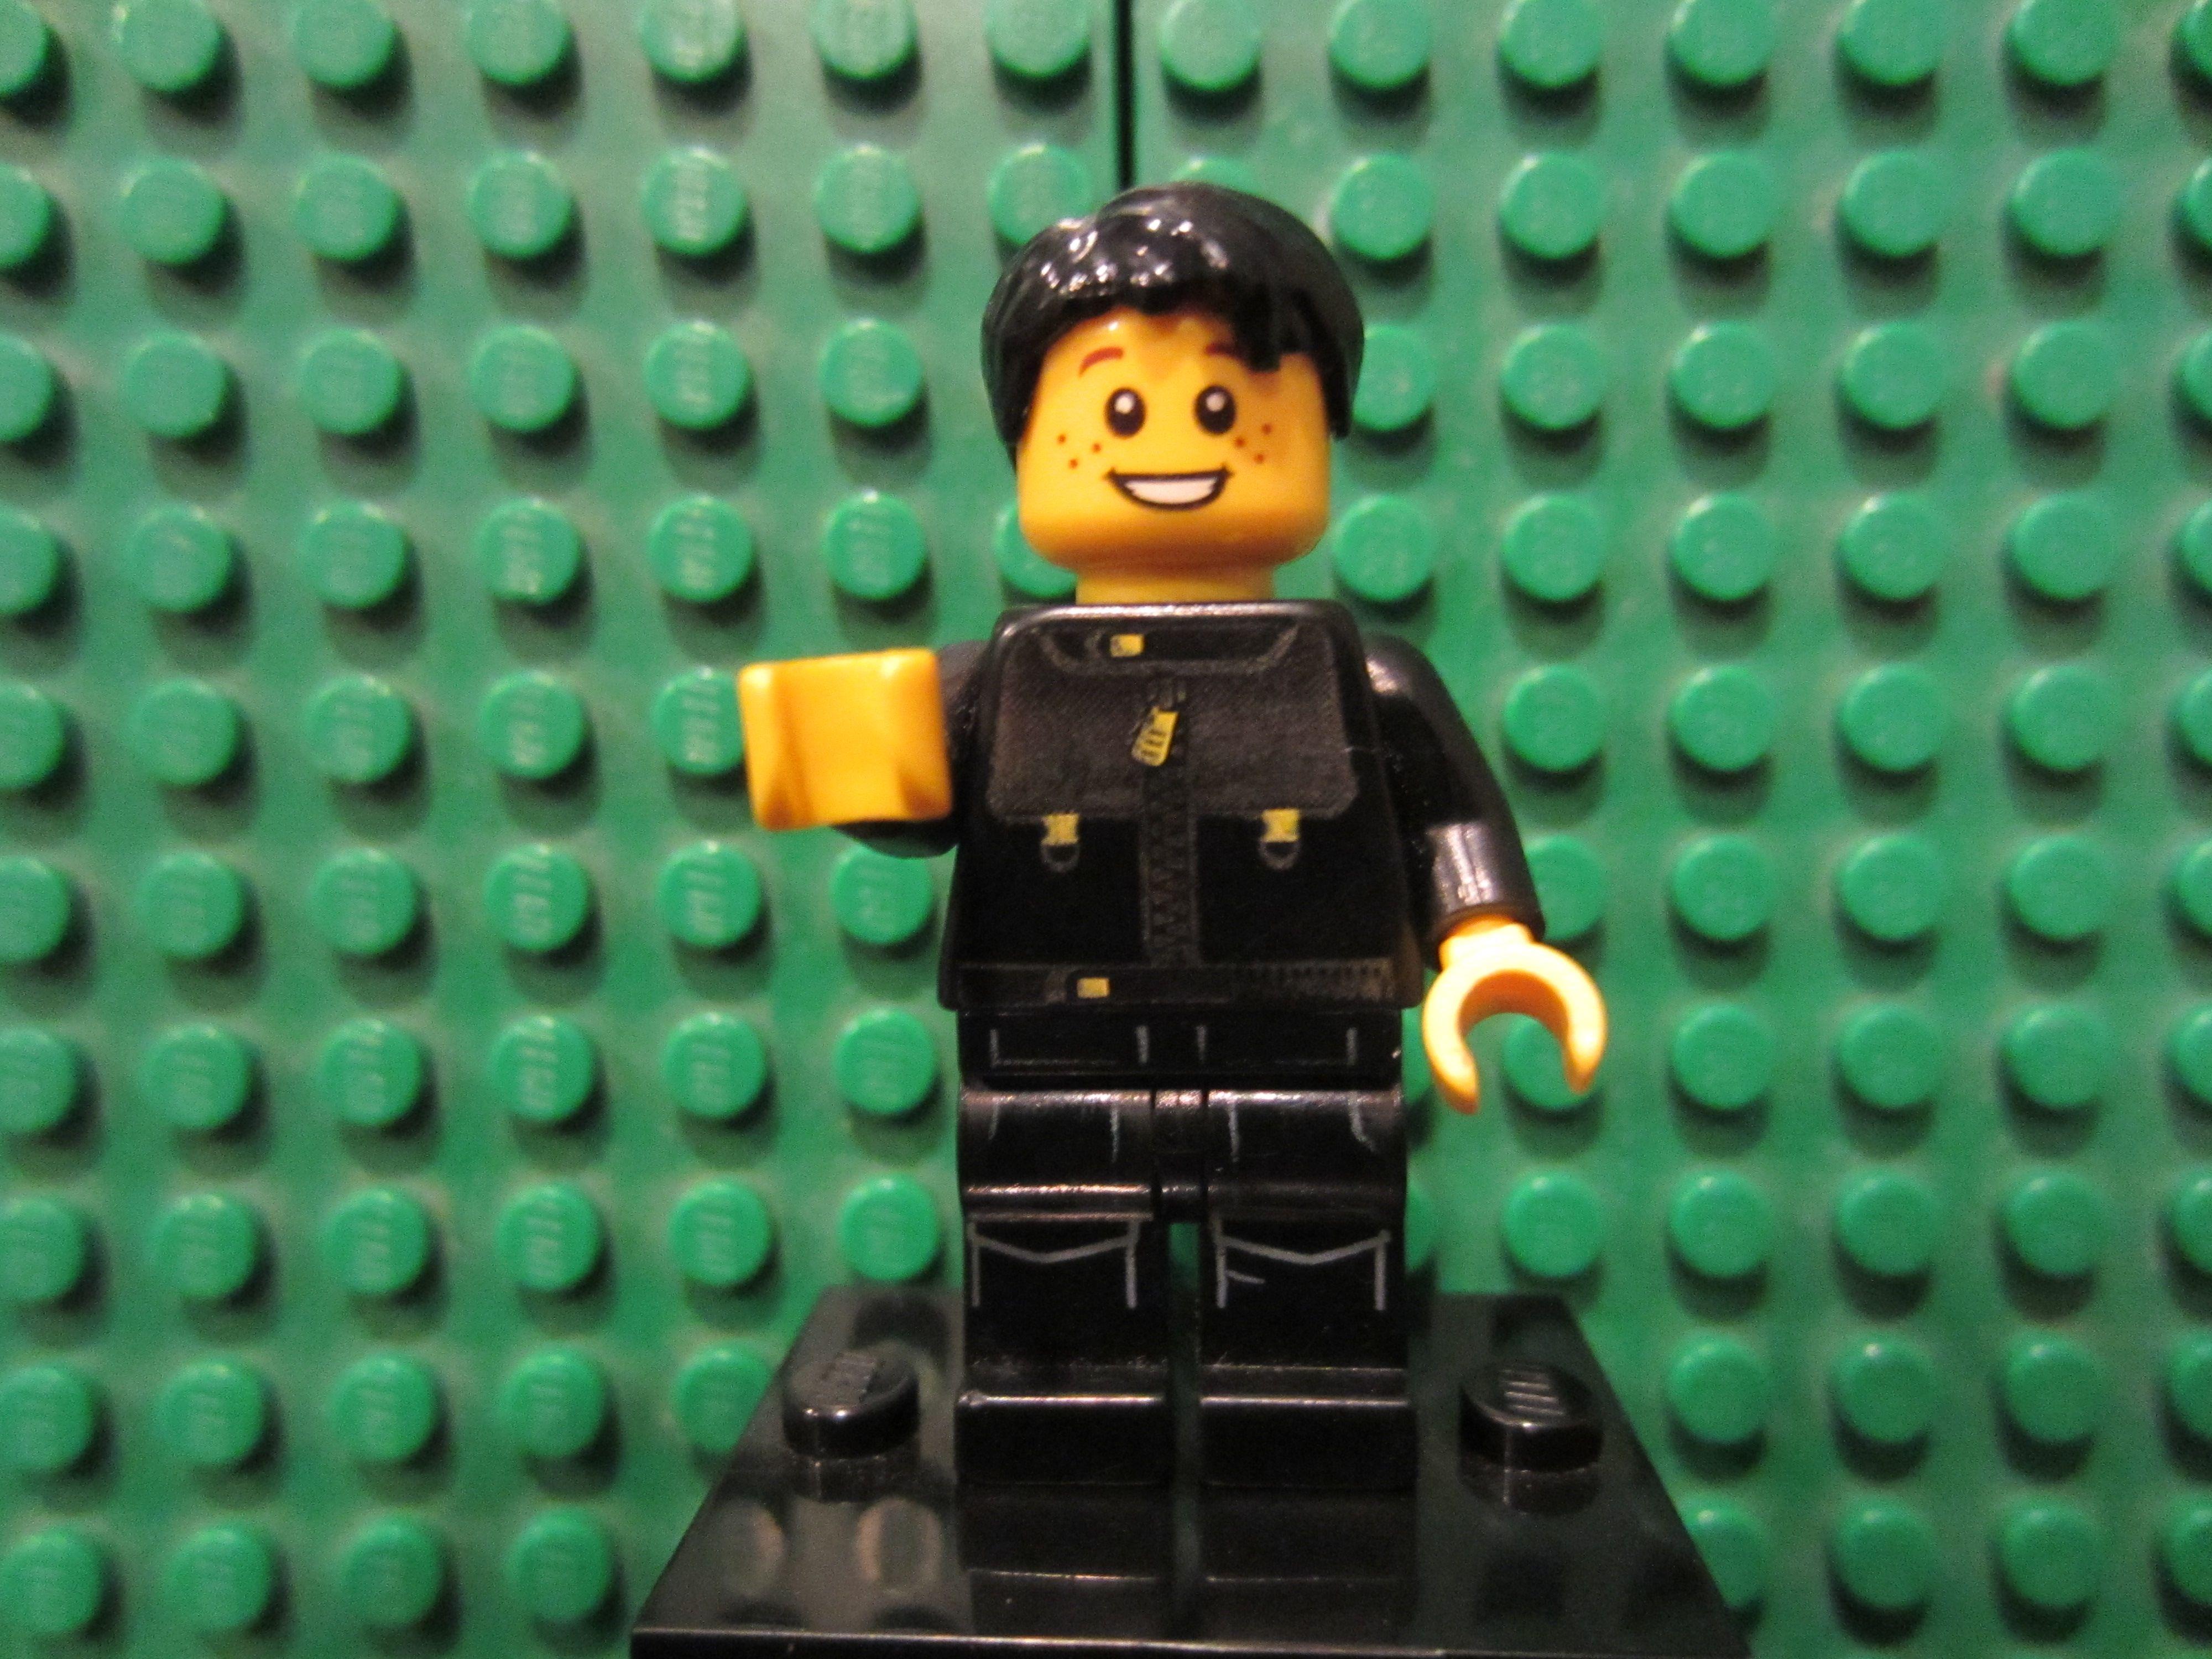 Lego John, my brother